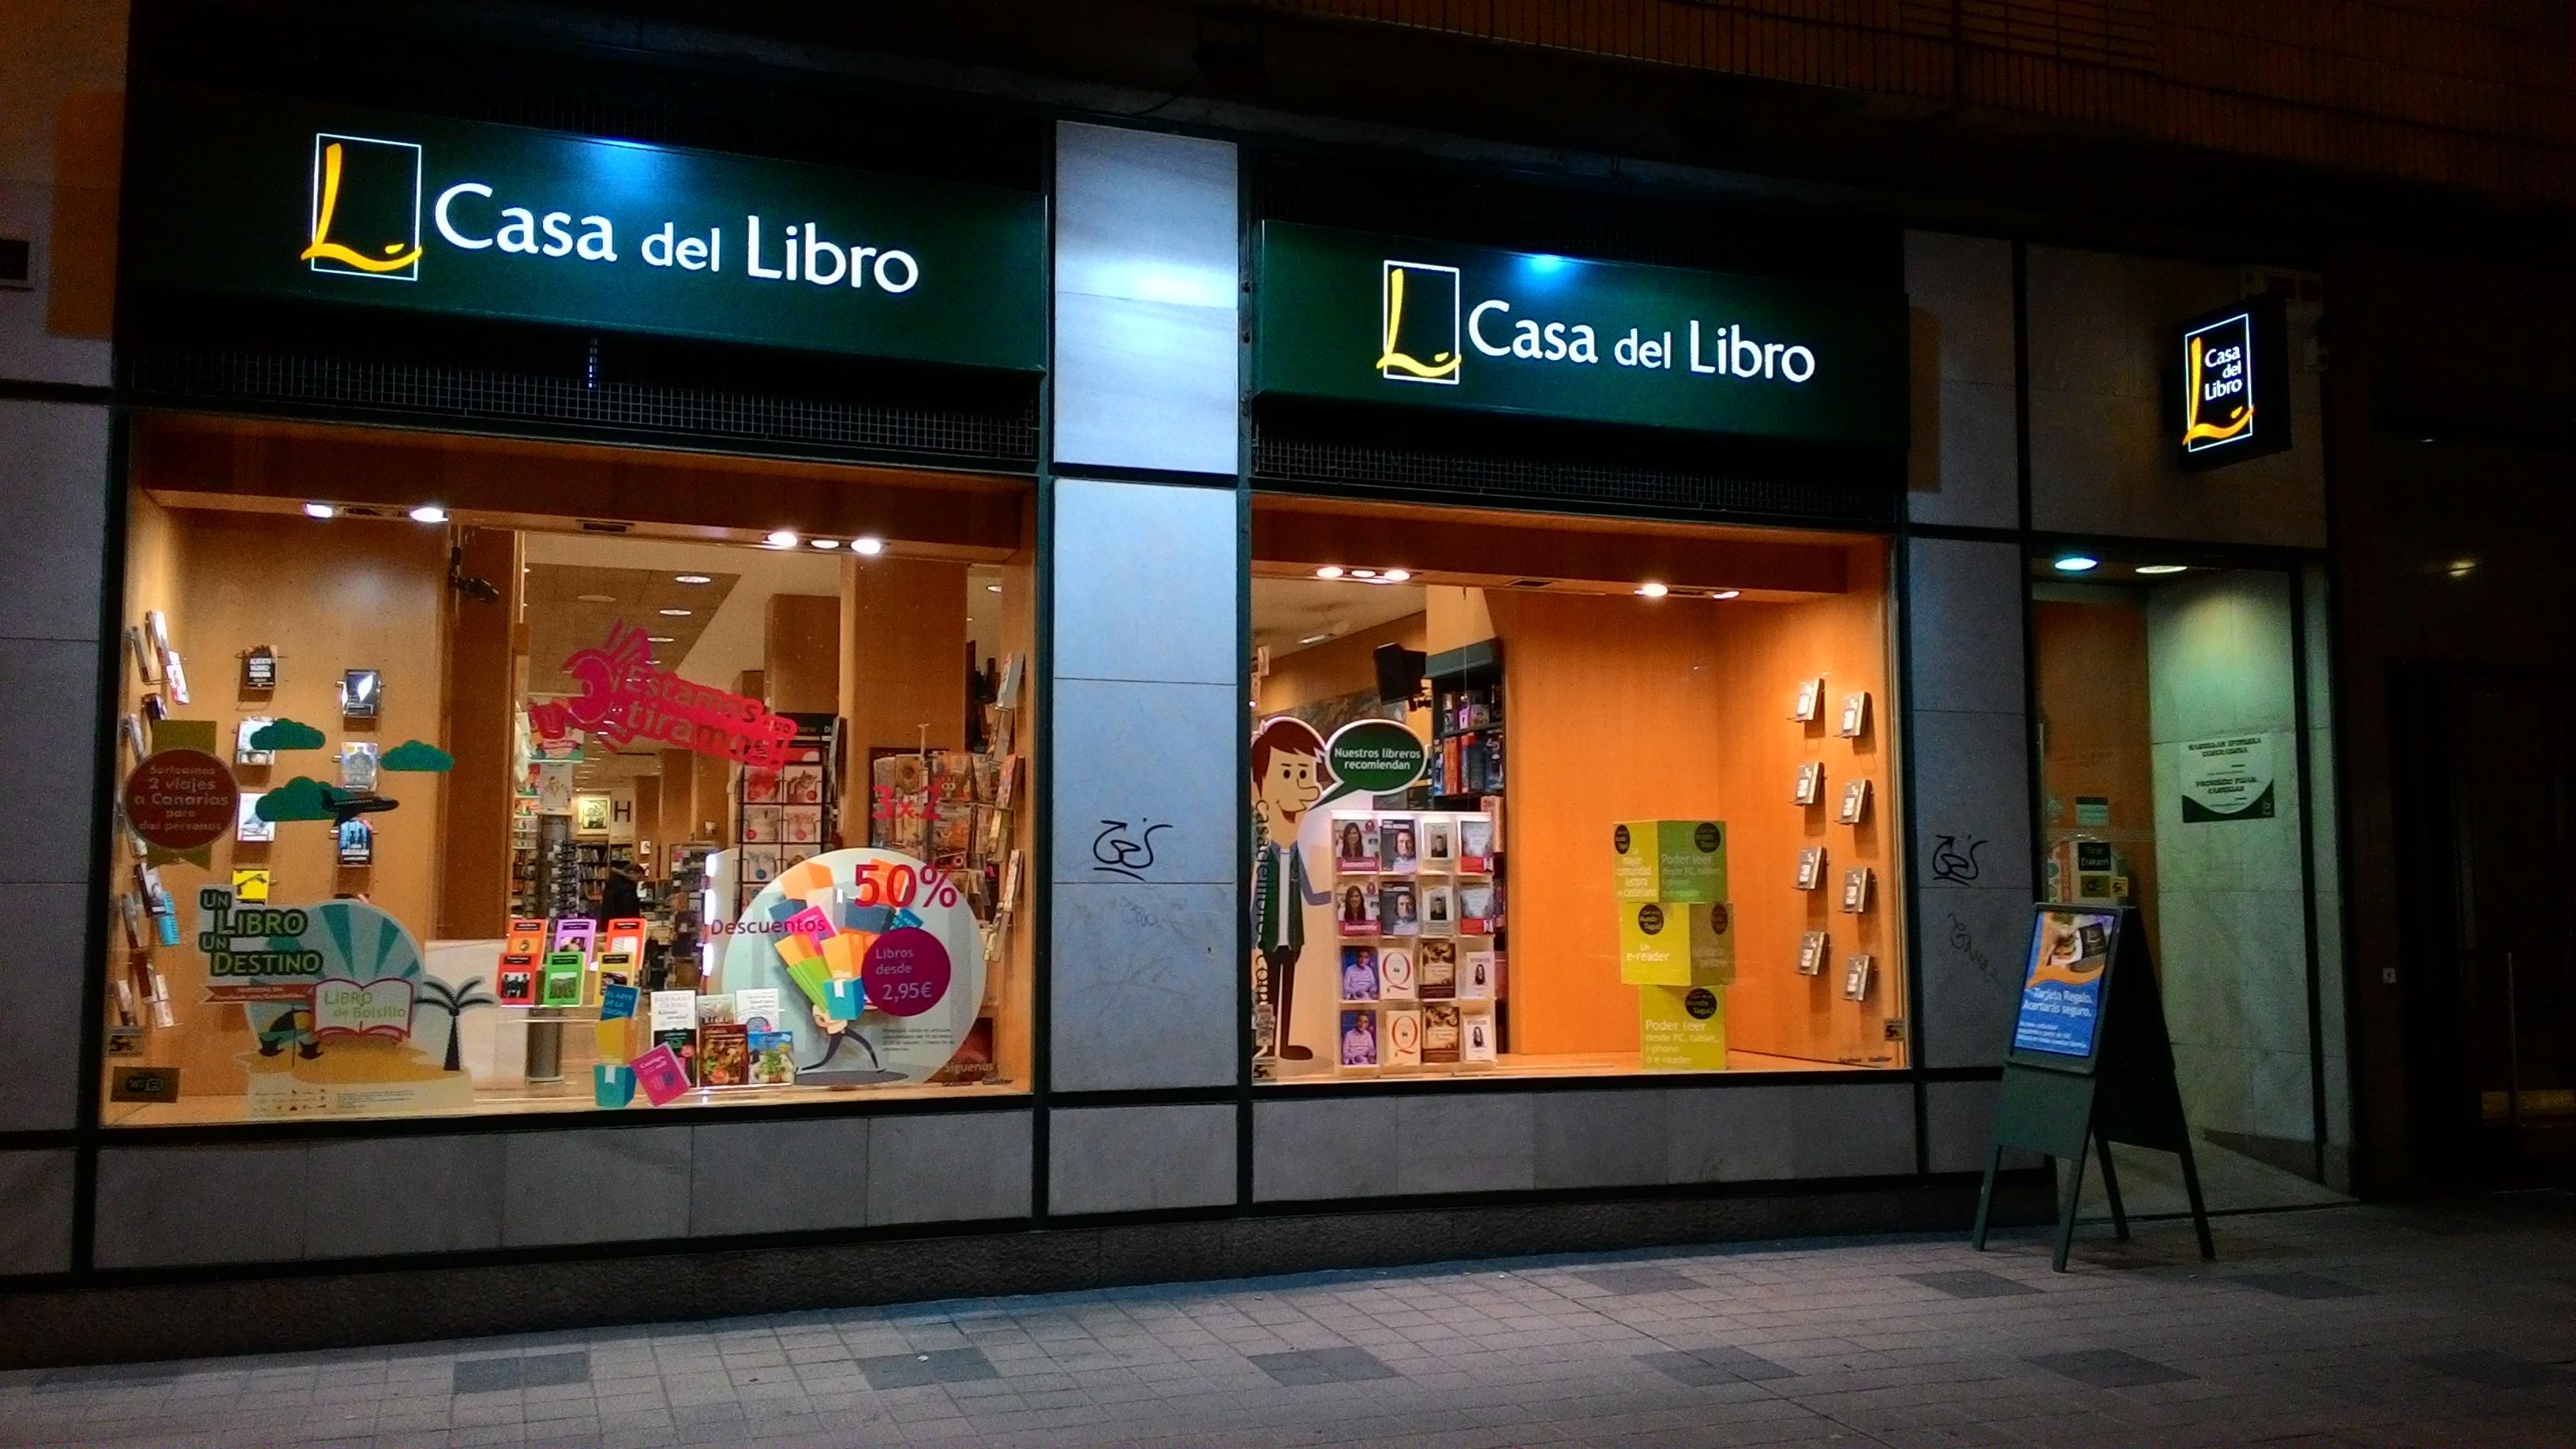 Librería Casa del Libro Arka, 11-Vitoria-Gasteiz